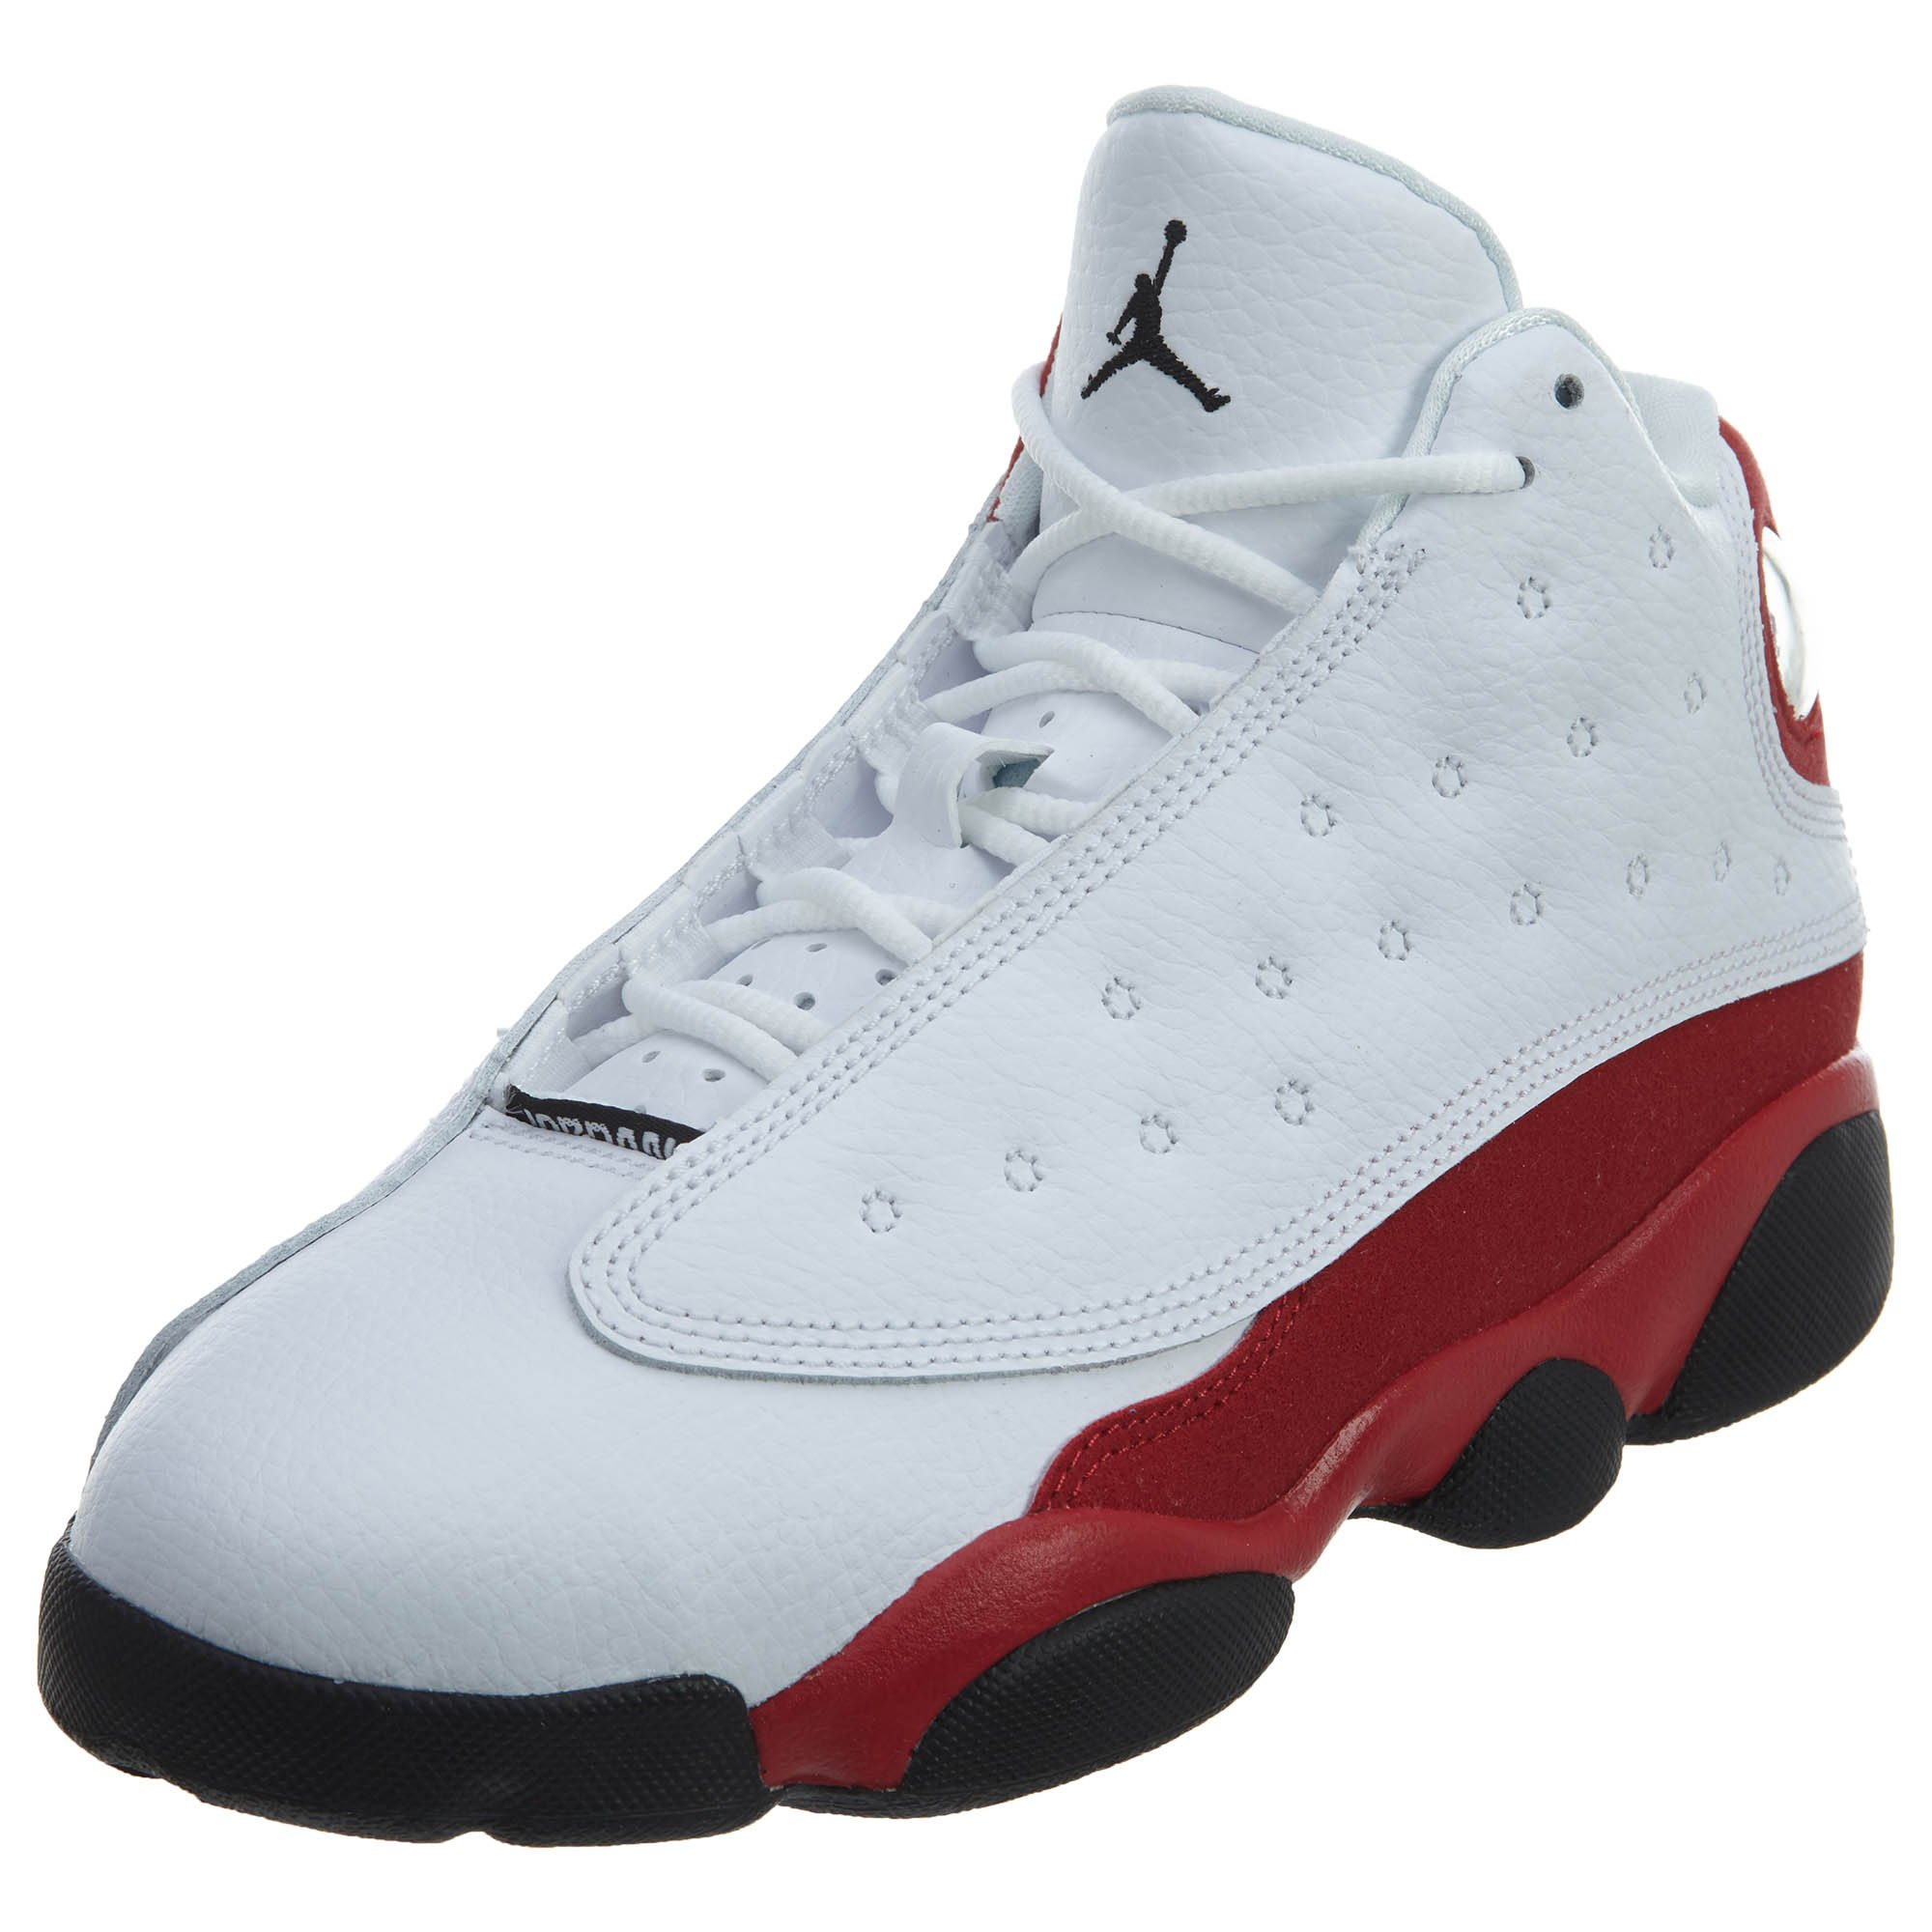 Jordan 13 RETRO BP BOYS PRE SCHOOL fashion-sneakers 414575-122_2.5Y - WHITE/BLACK-TRUE RED-COOL GREY by NIKE